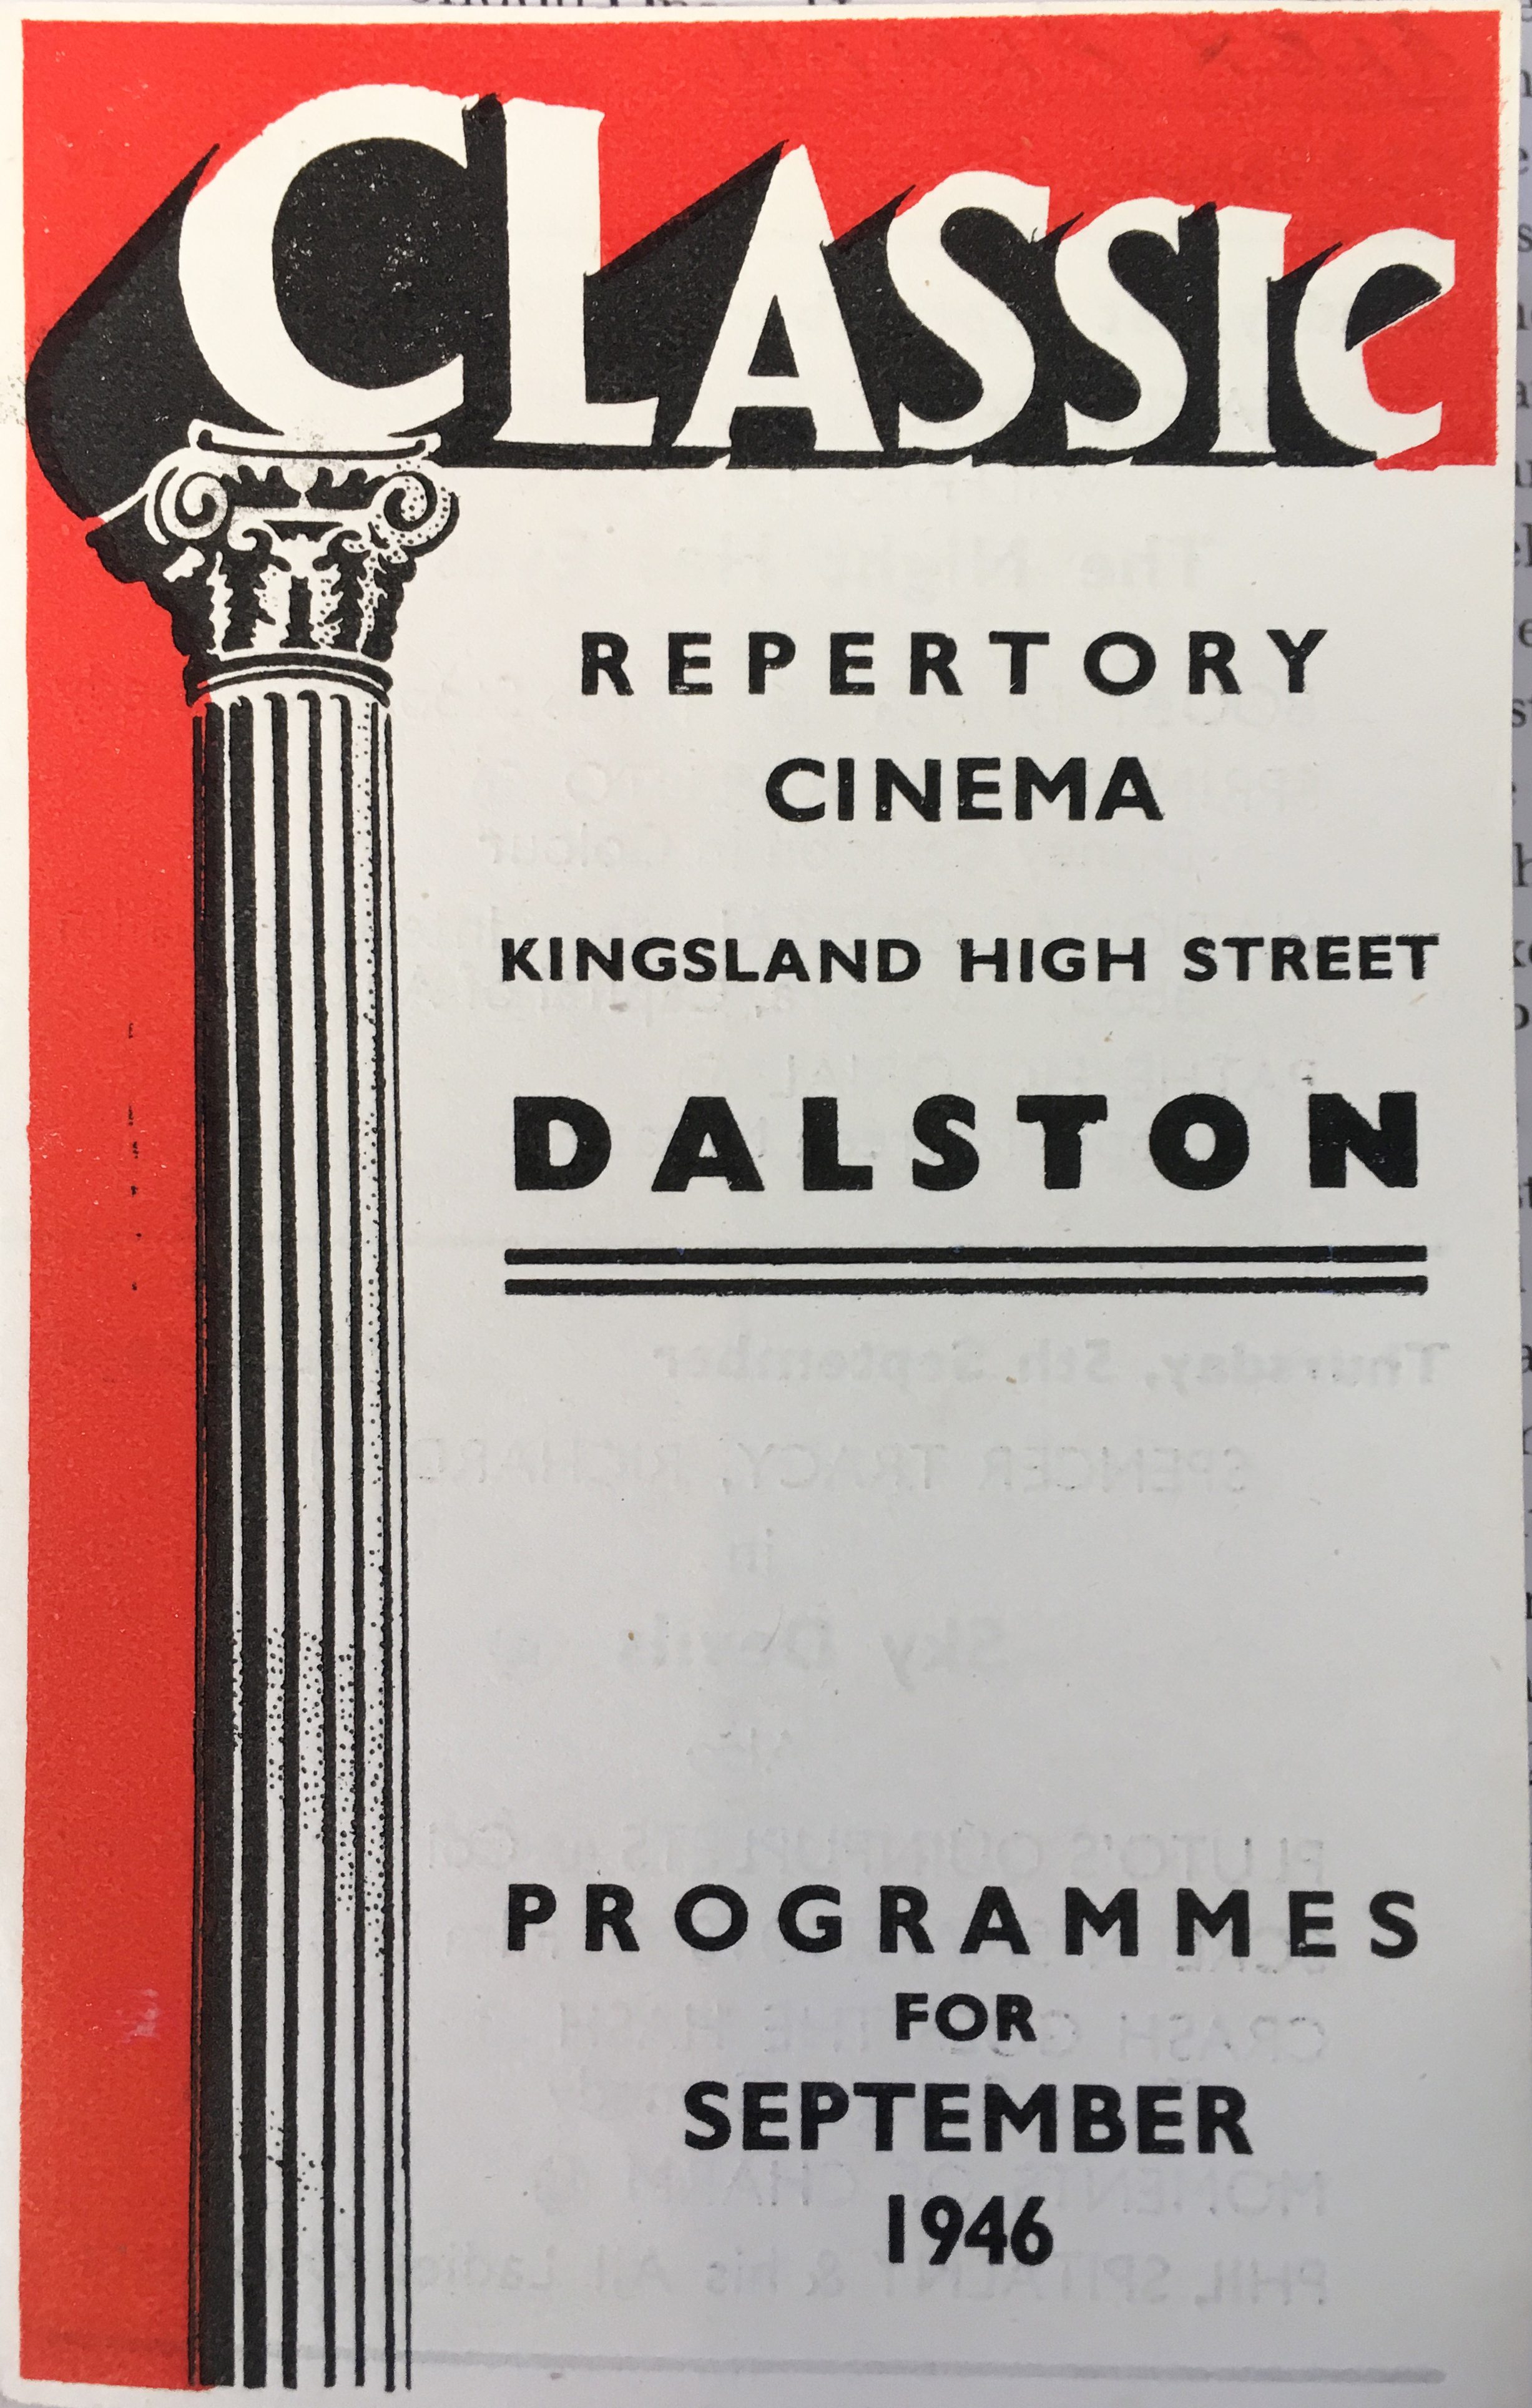 CLASSIC DALSTON 1946 PROGRAMME.jpg